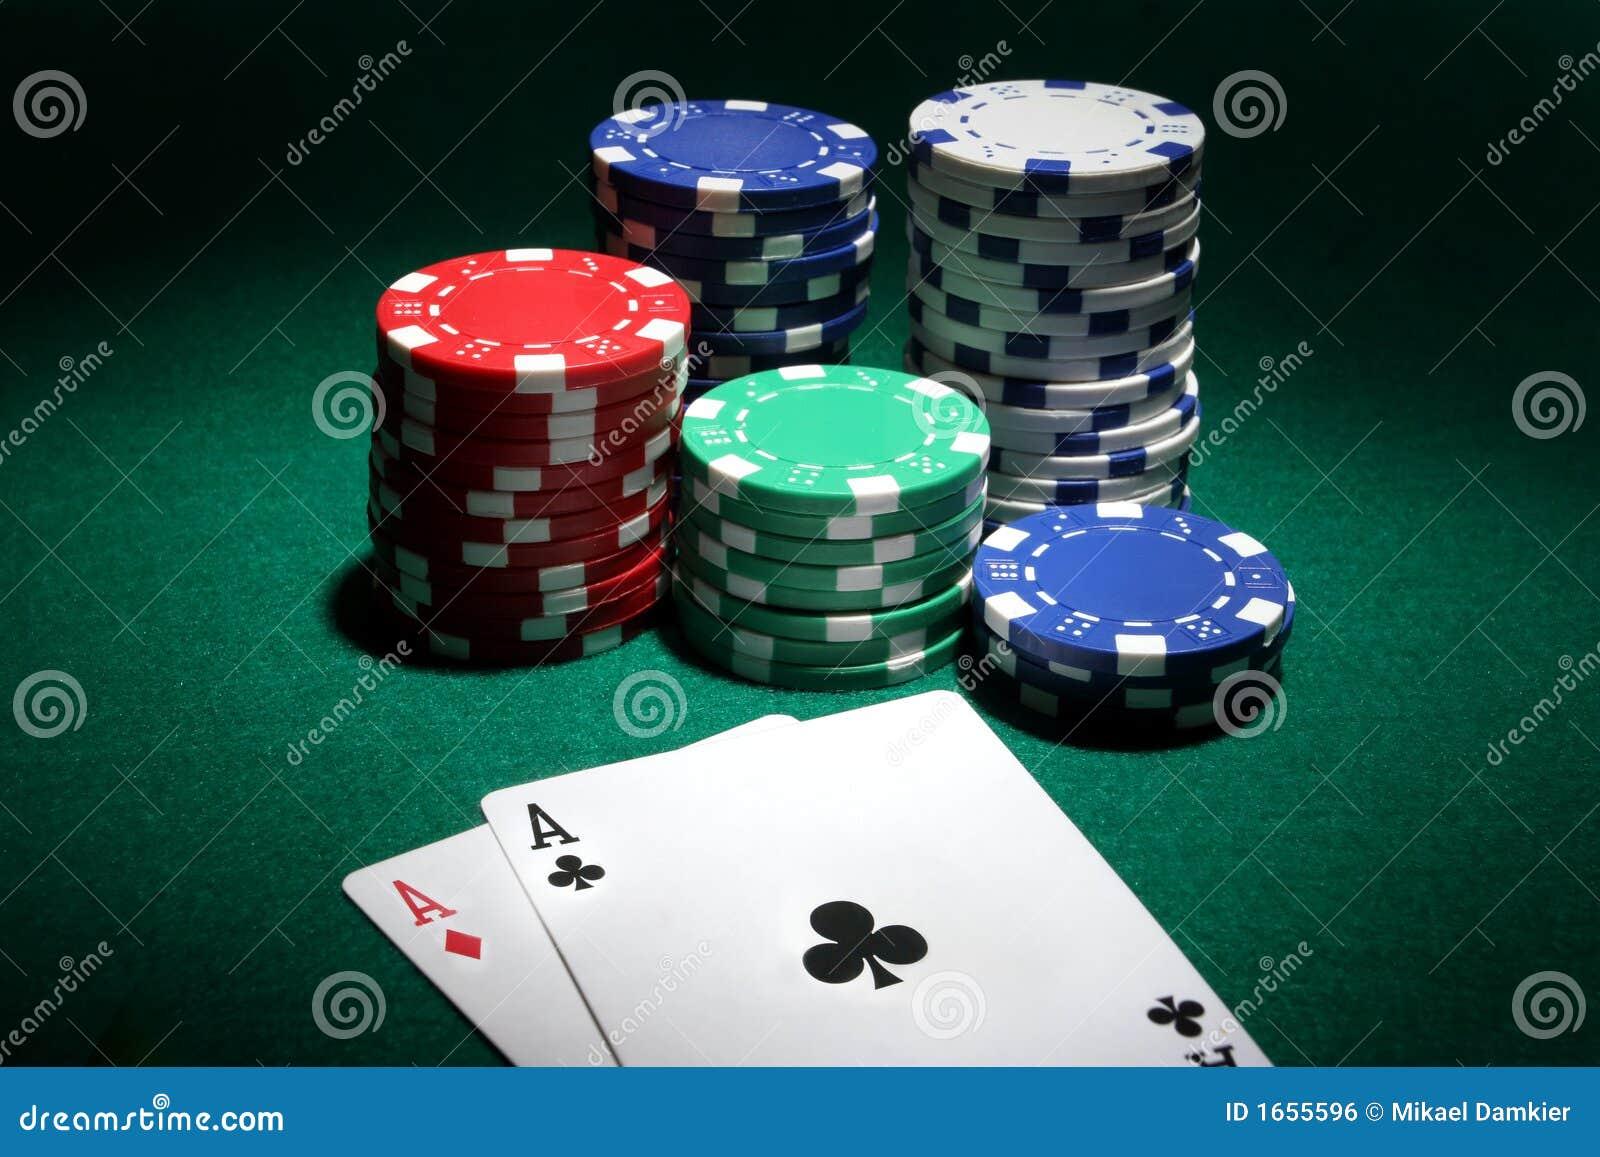 X stack bullies blackjack